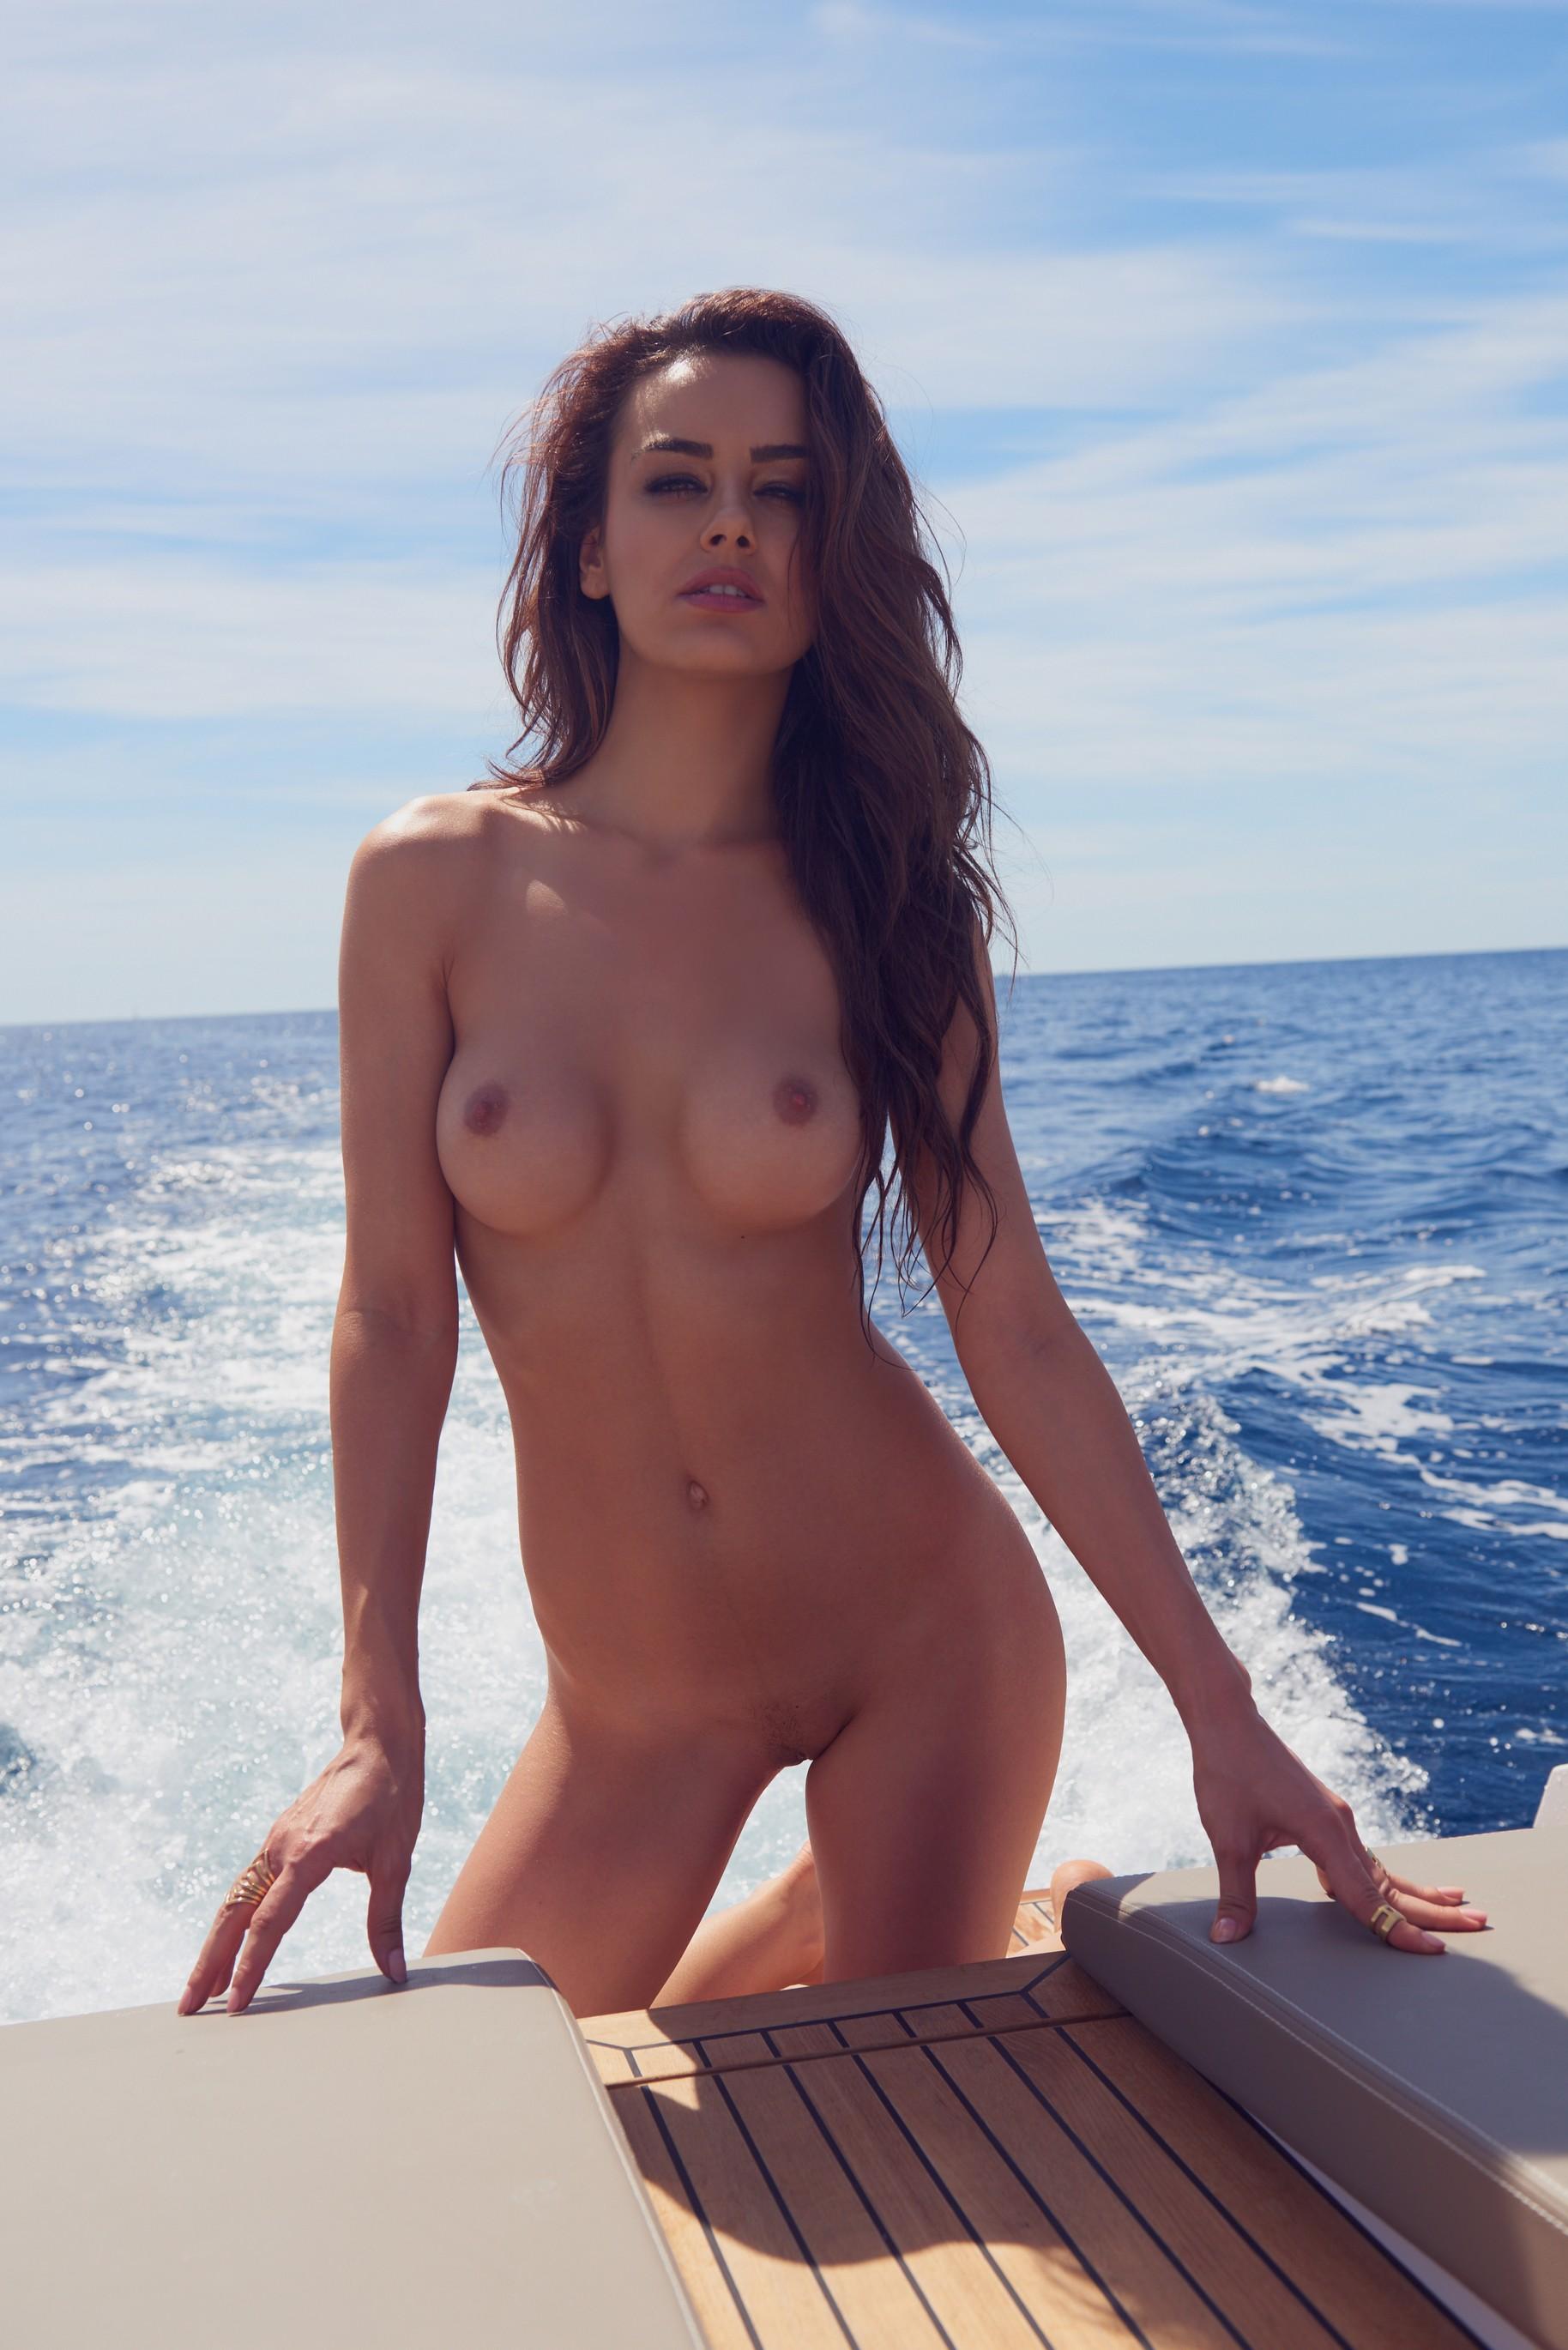 veronika-klimovits-naked-diving-motorboat-seaside-playboy-19